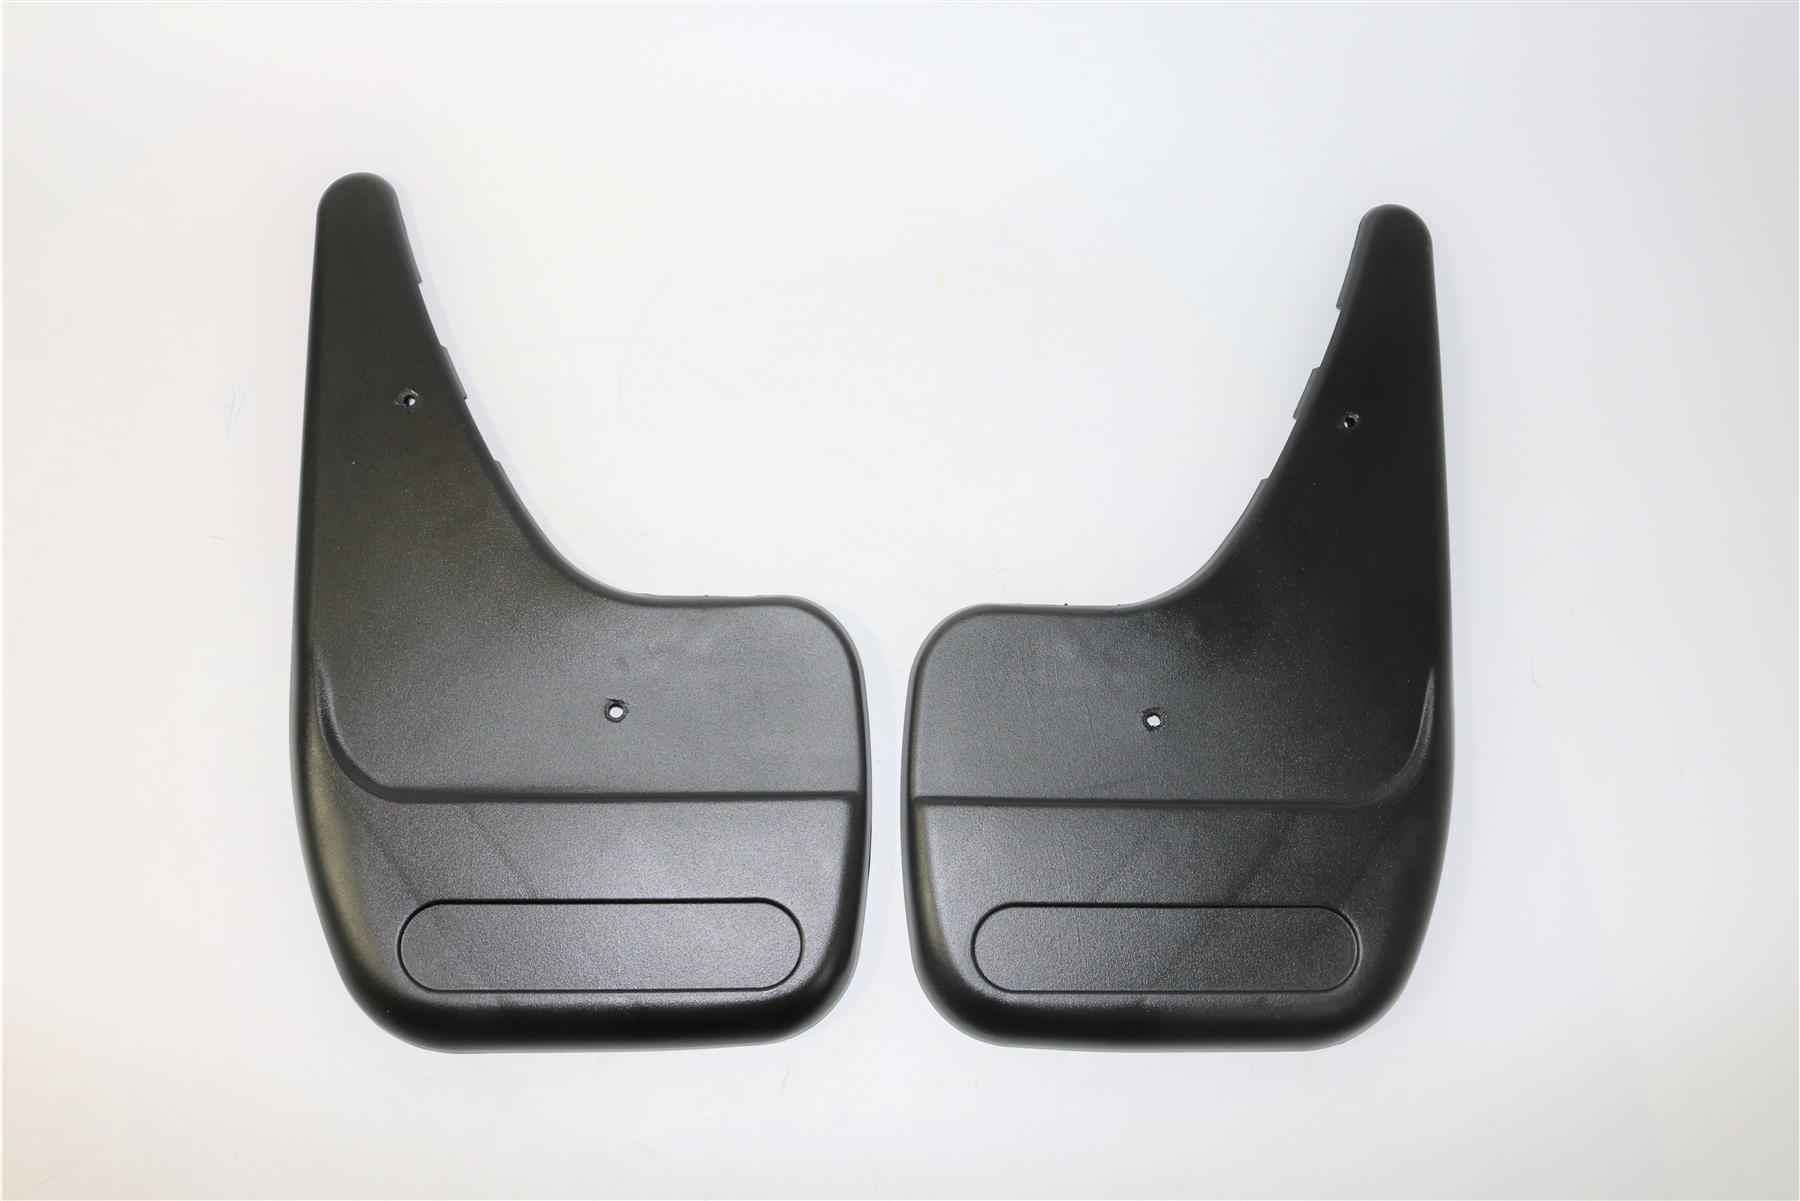 Genuine Peugeot Boxer Citroen Relay Rear Mudflaps Mudguards 9603S5 2006-Onwards